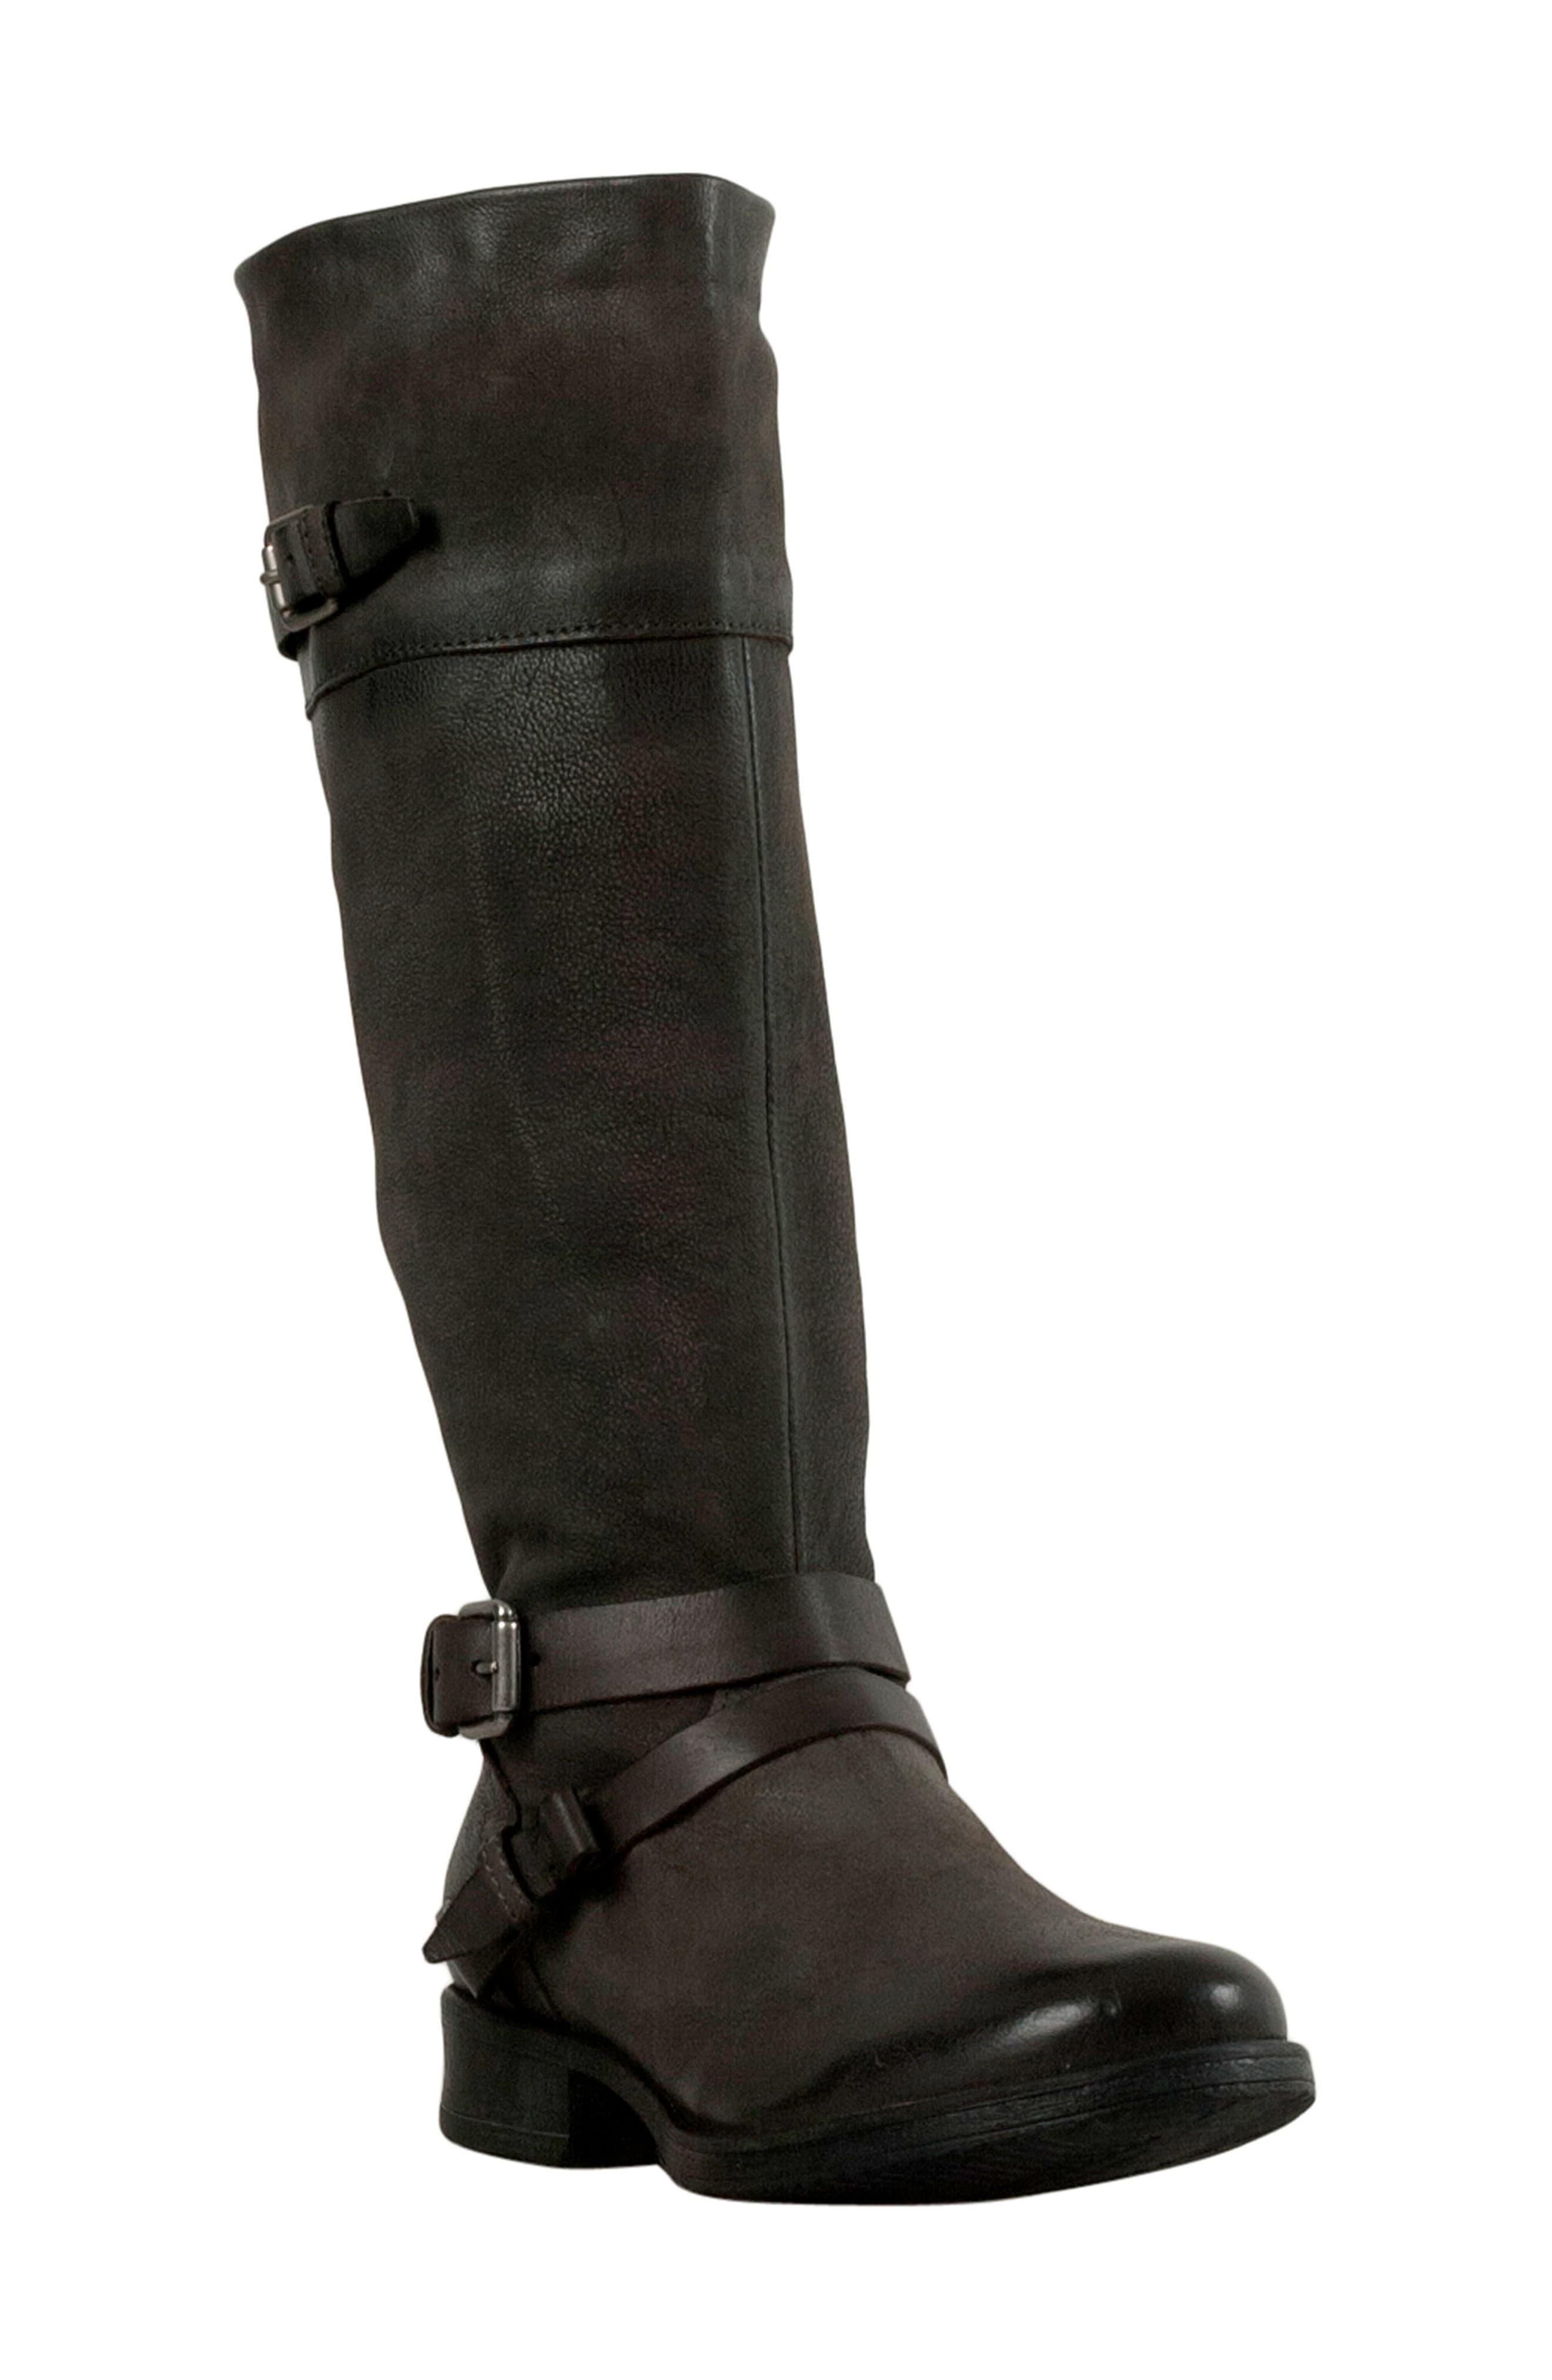 9cae016467a3 Miz Mooz Nashua Knee High Boot in 2019 | Products | Knee High Boots ...